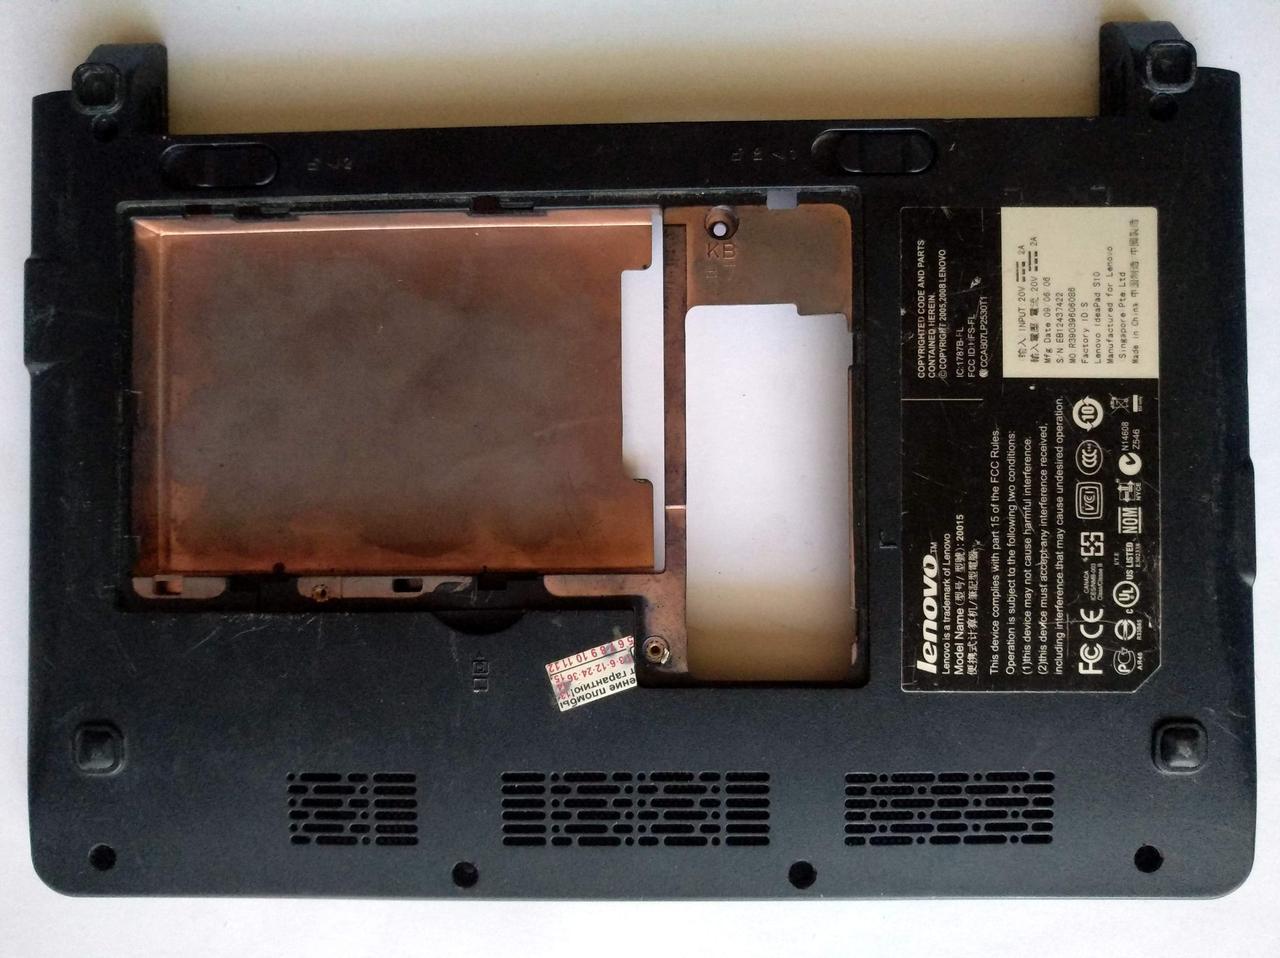 443 Корпус дно Lenovo S10 S9 S10-1 - 37FL1BC0060